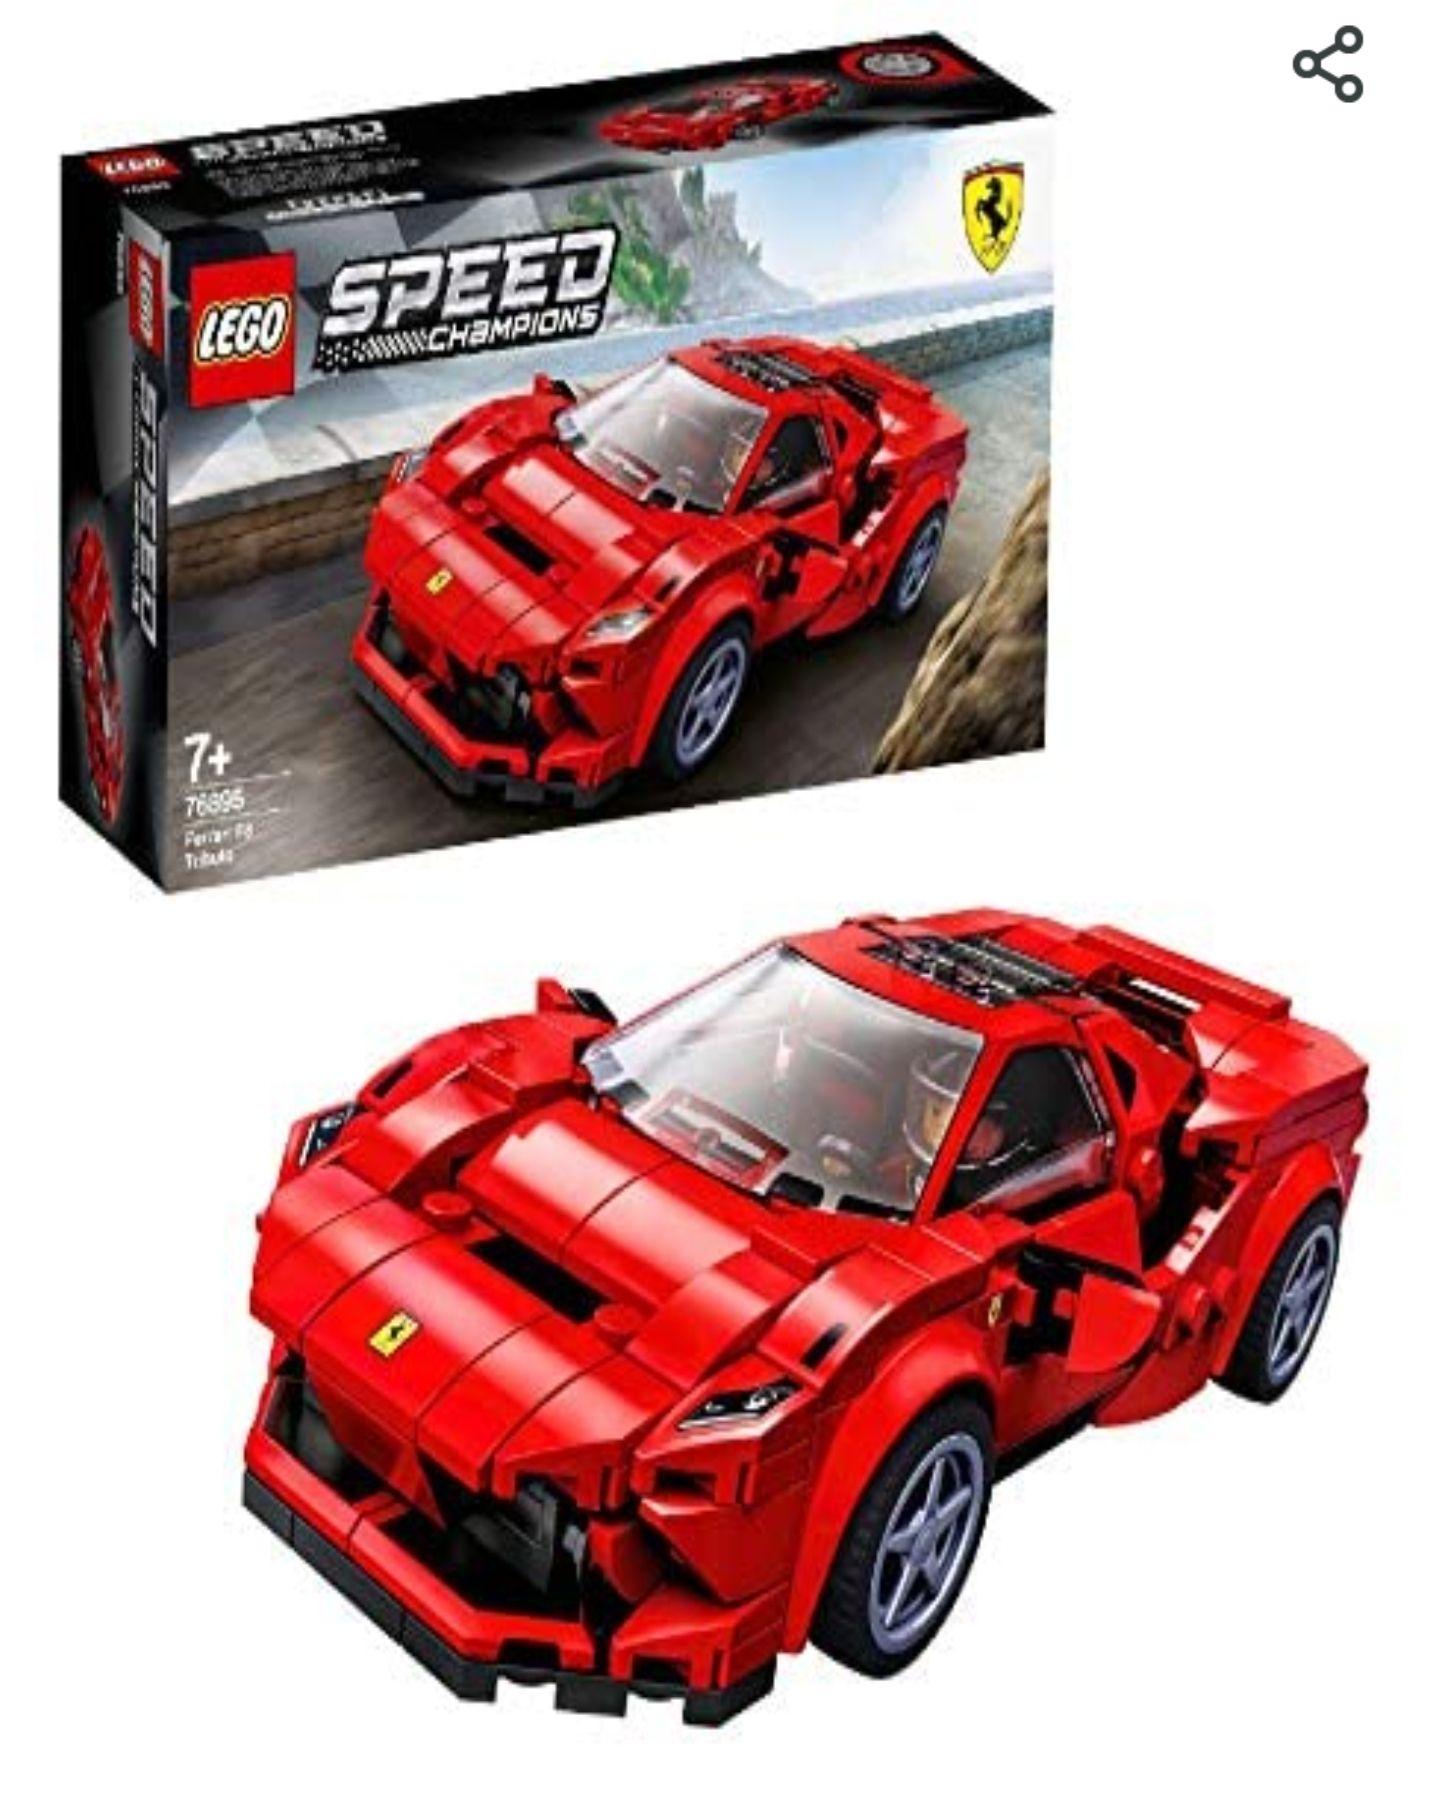 LEGO Speed Champions 76895 Ferrari F8 Tributo £13.19 Prime +£4.49 Non Prime (UK Mainland) Sold by Amazon EU @ Amazon